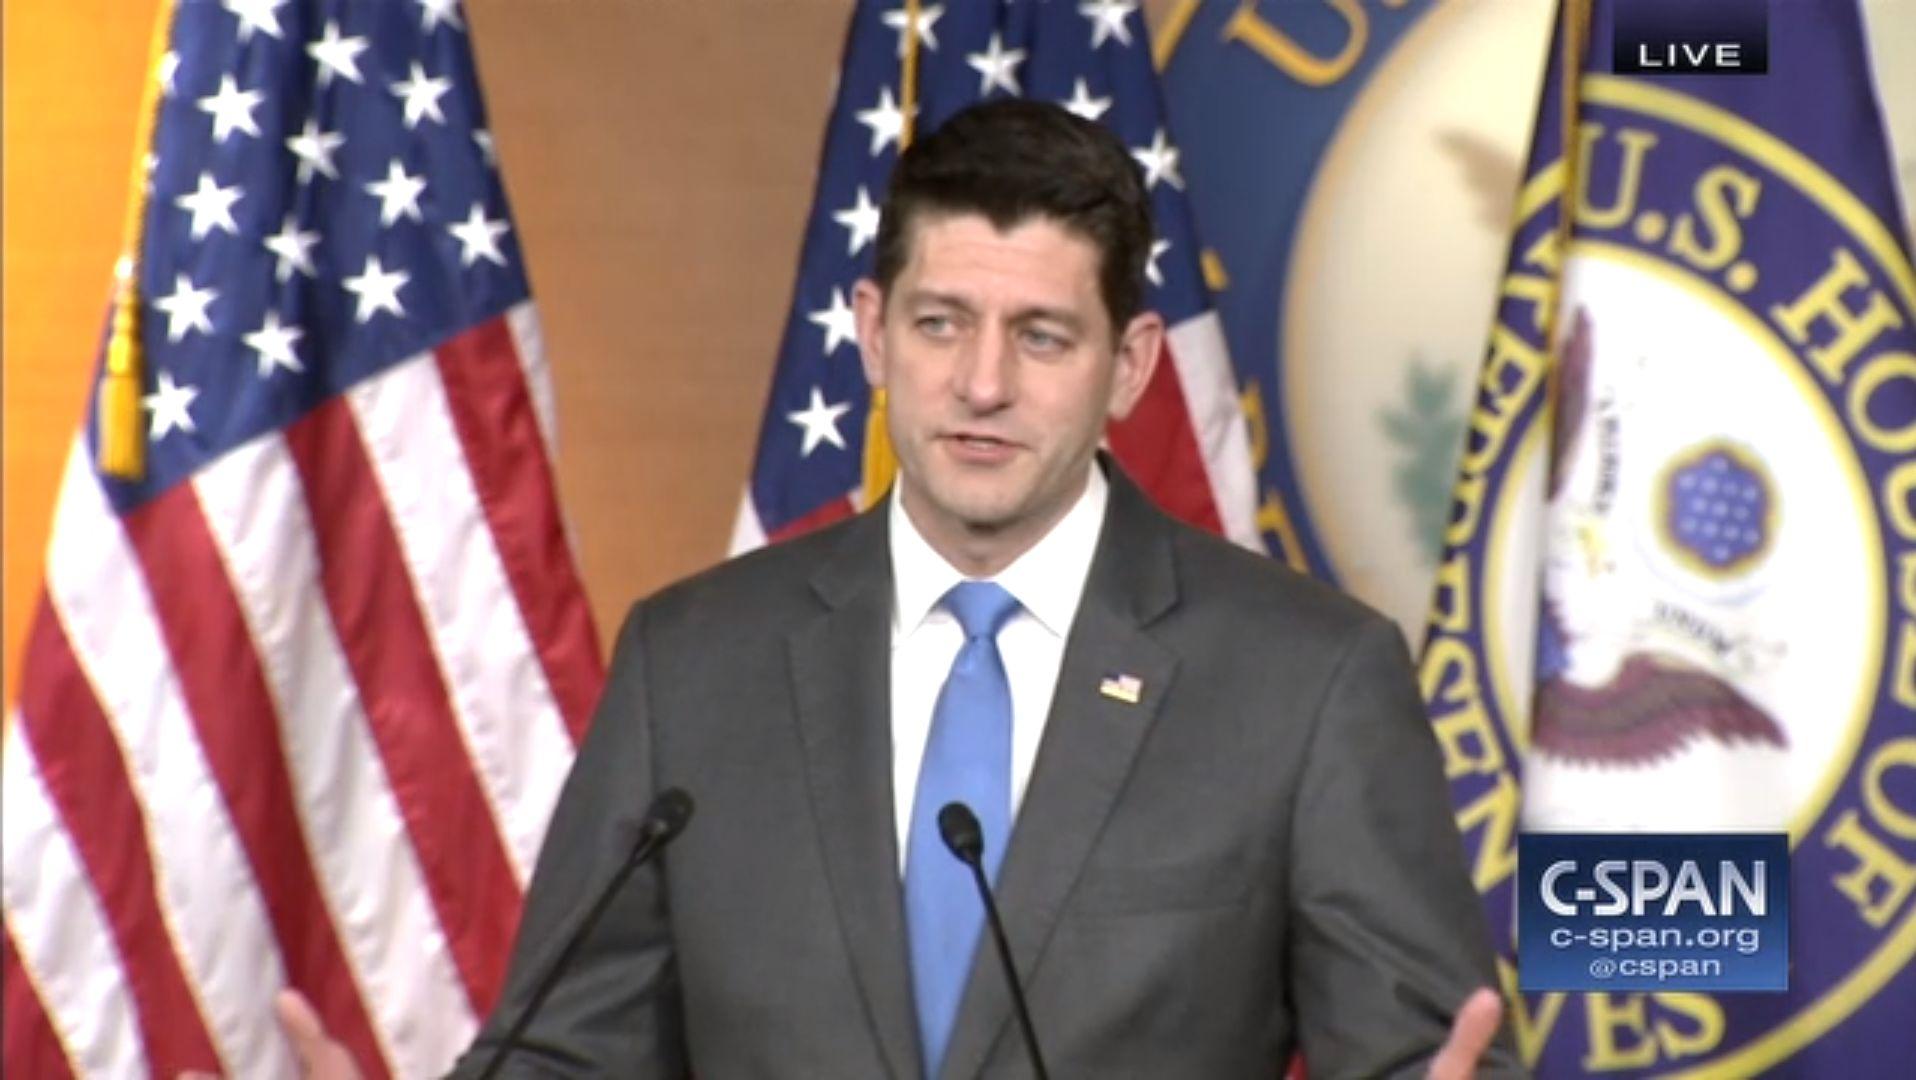 U.S. House Speaker Paul Ryan Confirms His Retirement